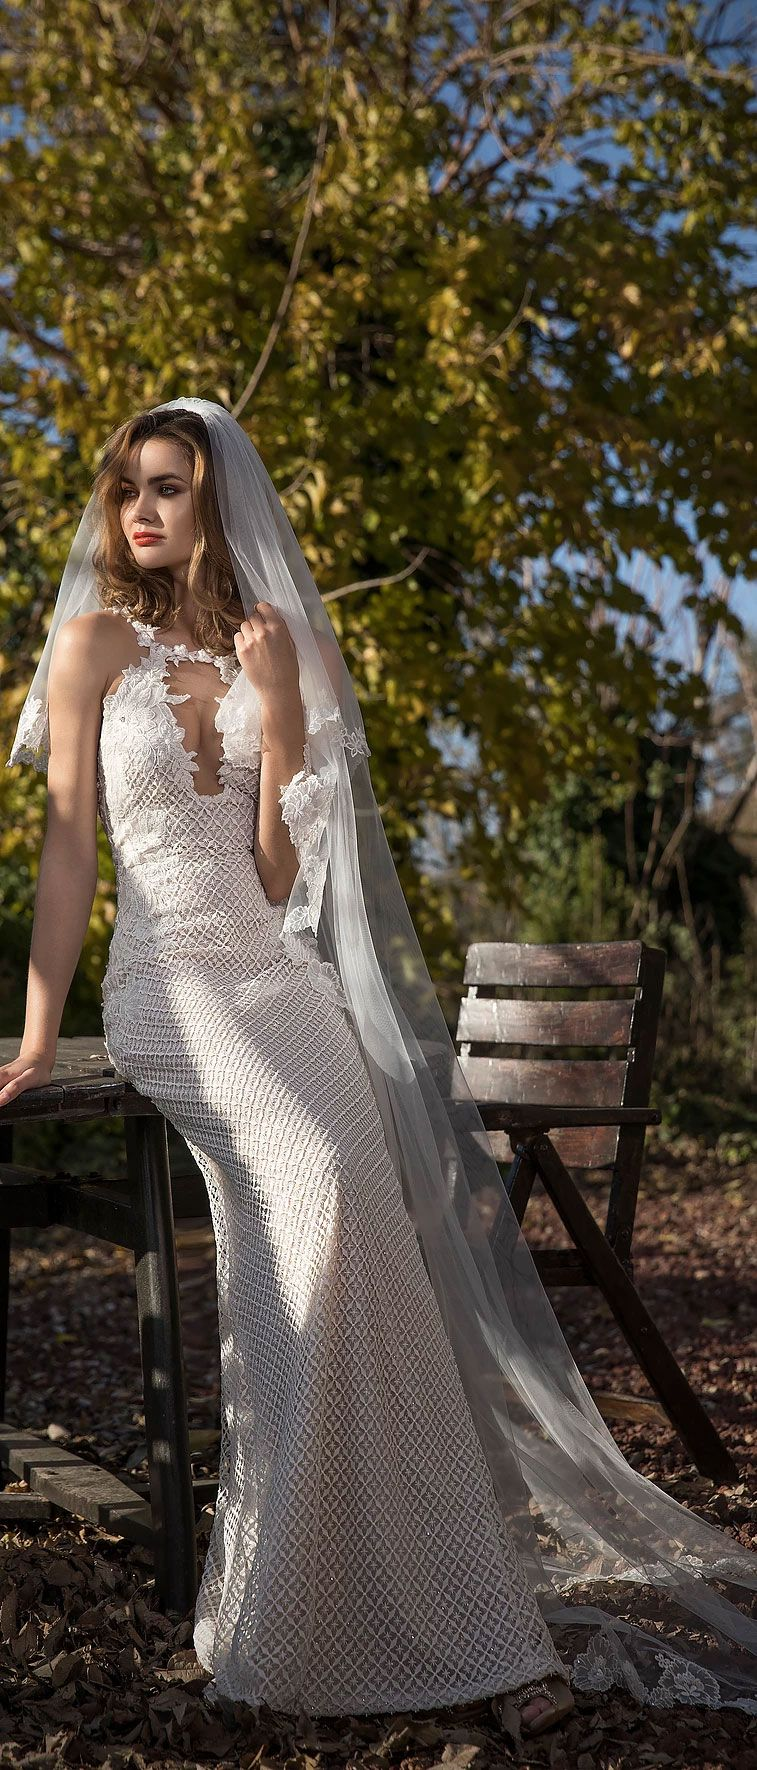 Henika Wedding Dresses – Flying Transparency Bridal Collection